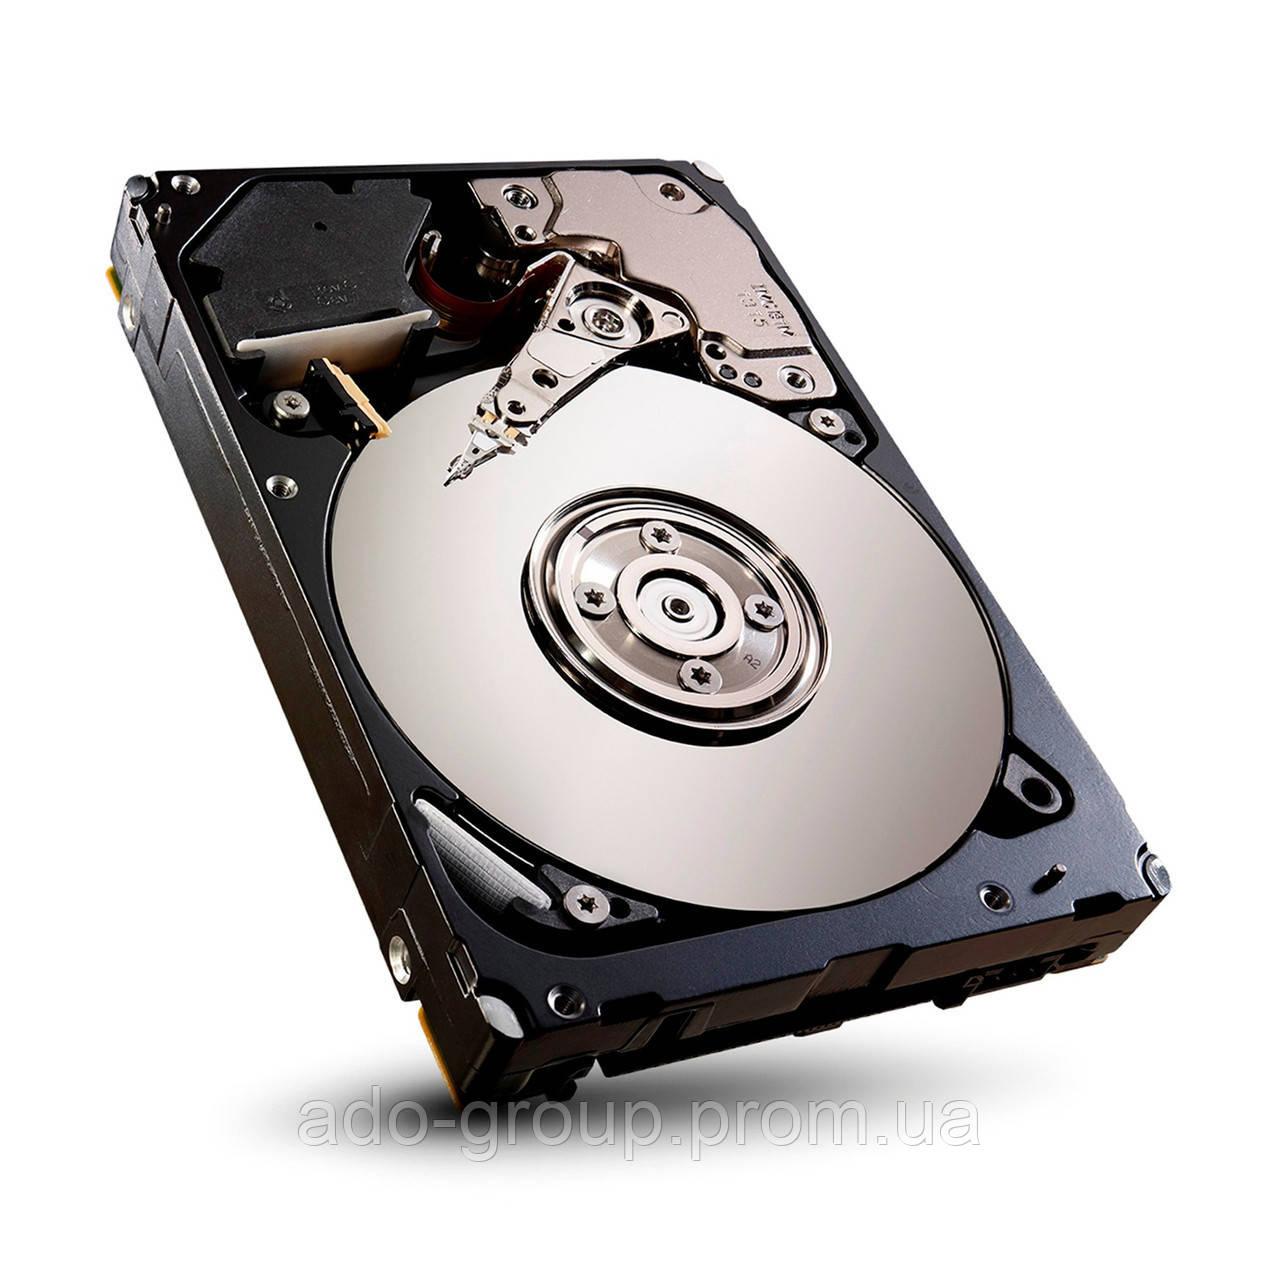 "0F617N Жесткий диск Dell 300Gb SAS 15K  3.5"" +"